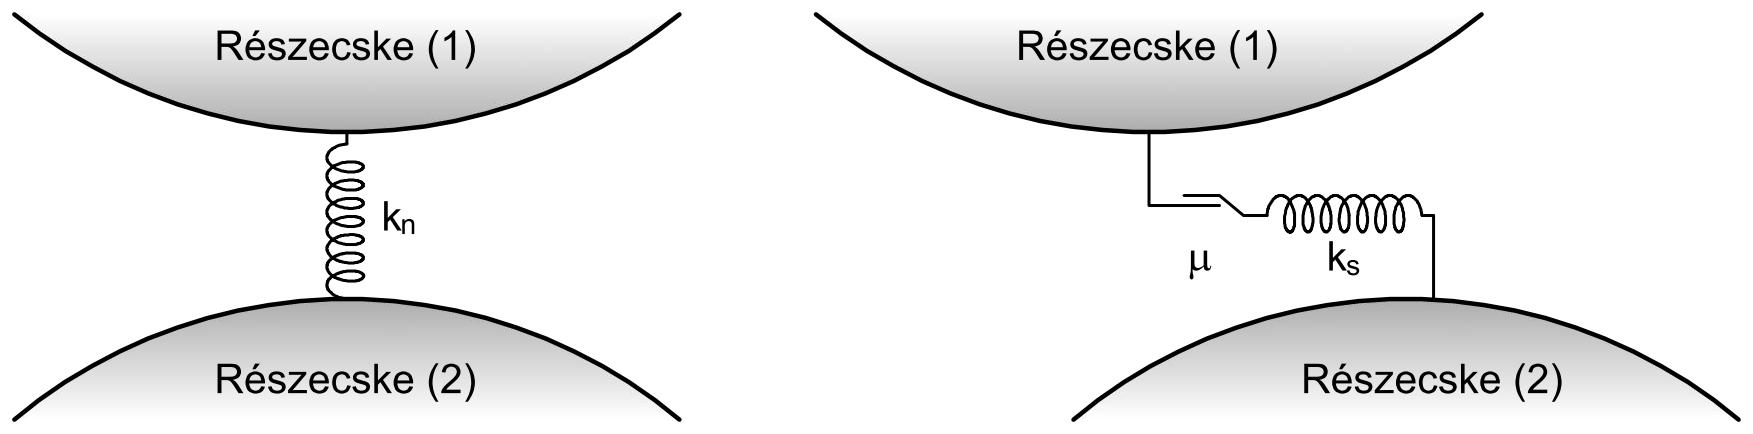 7_particle-model2